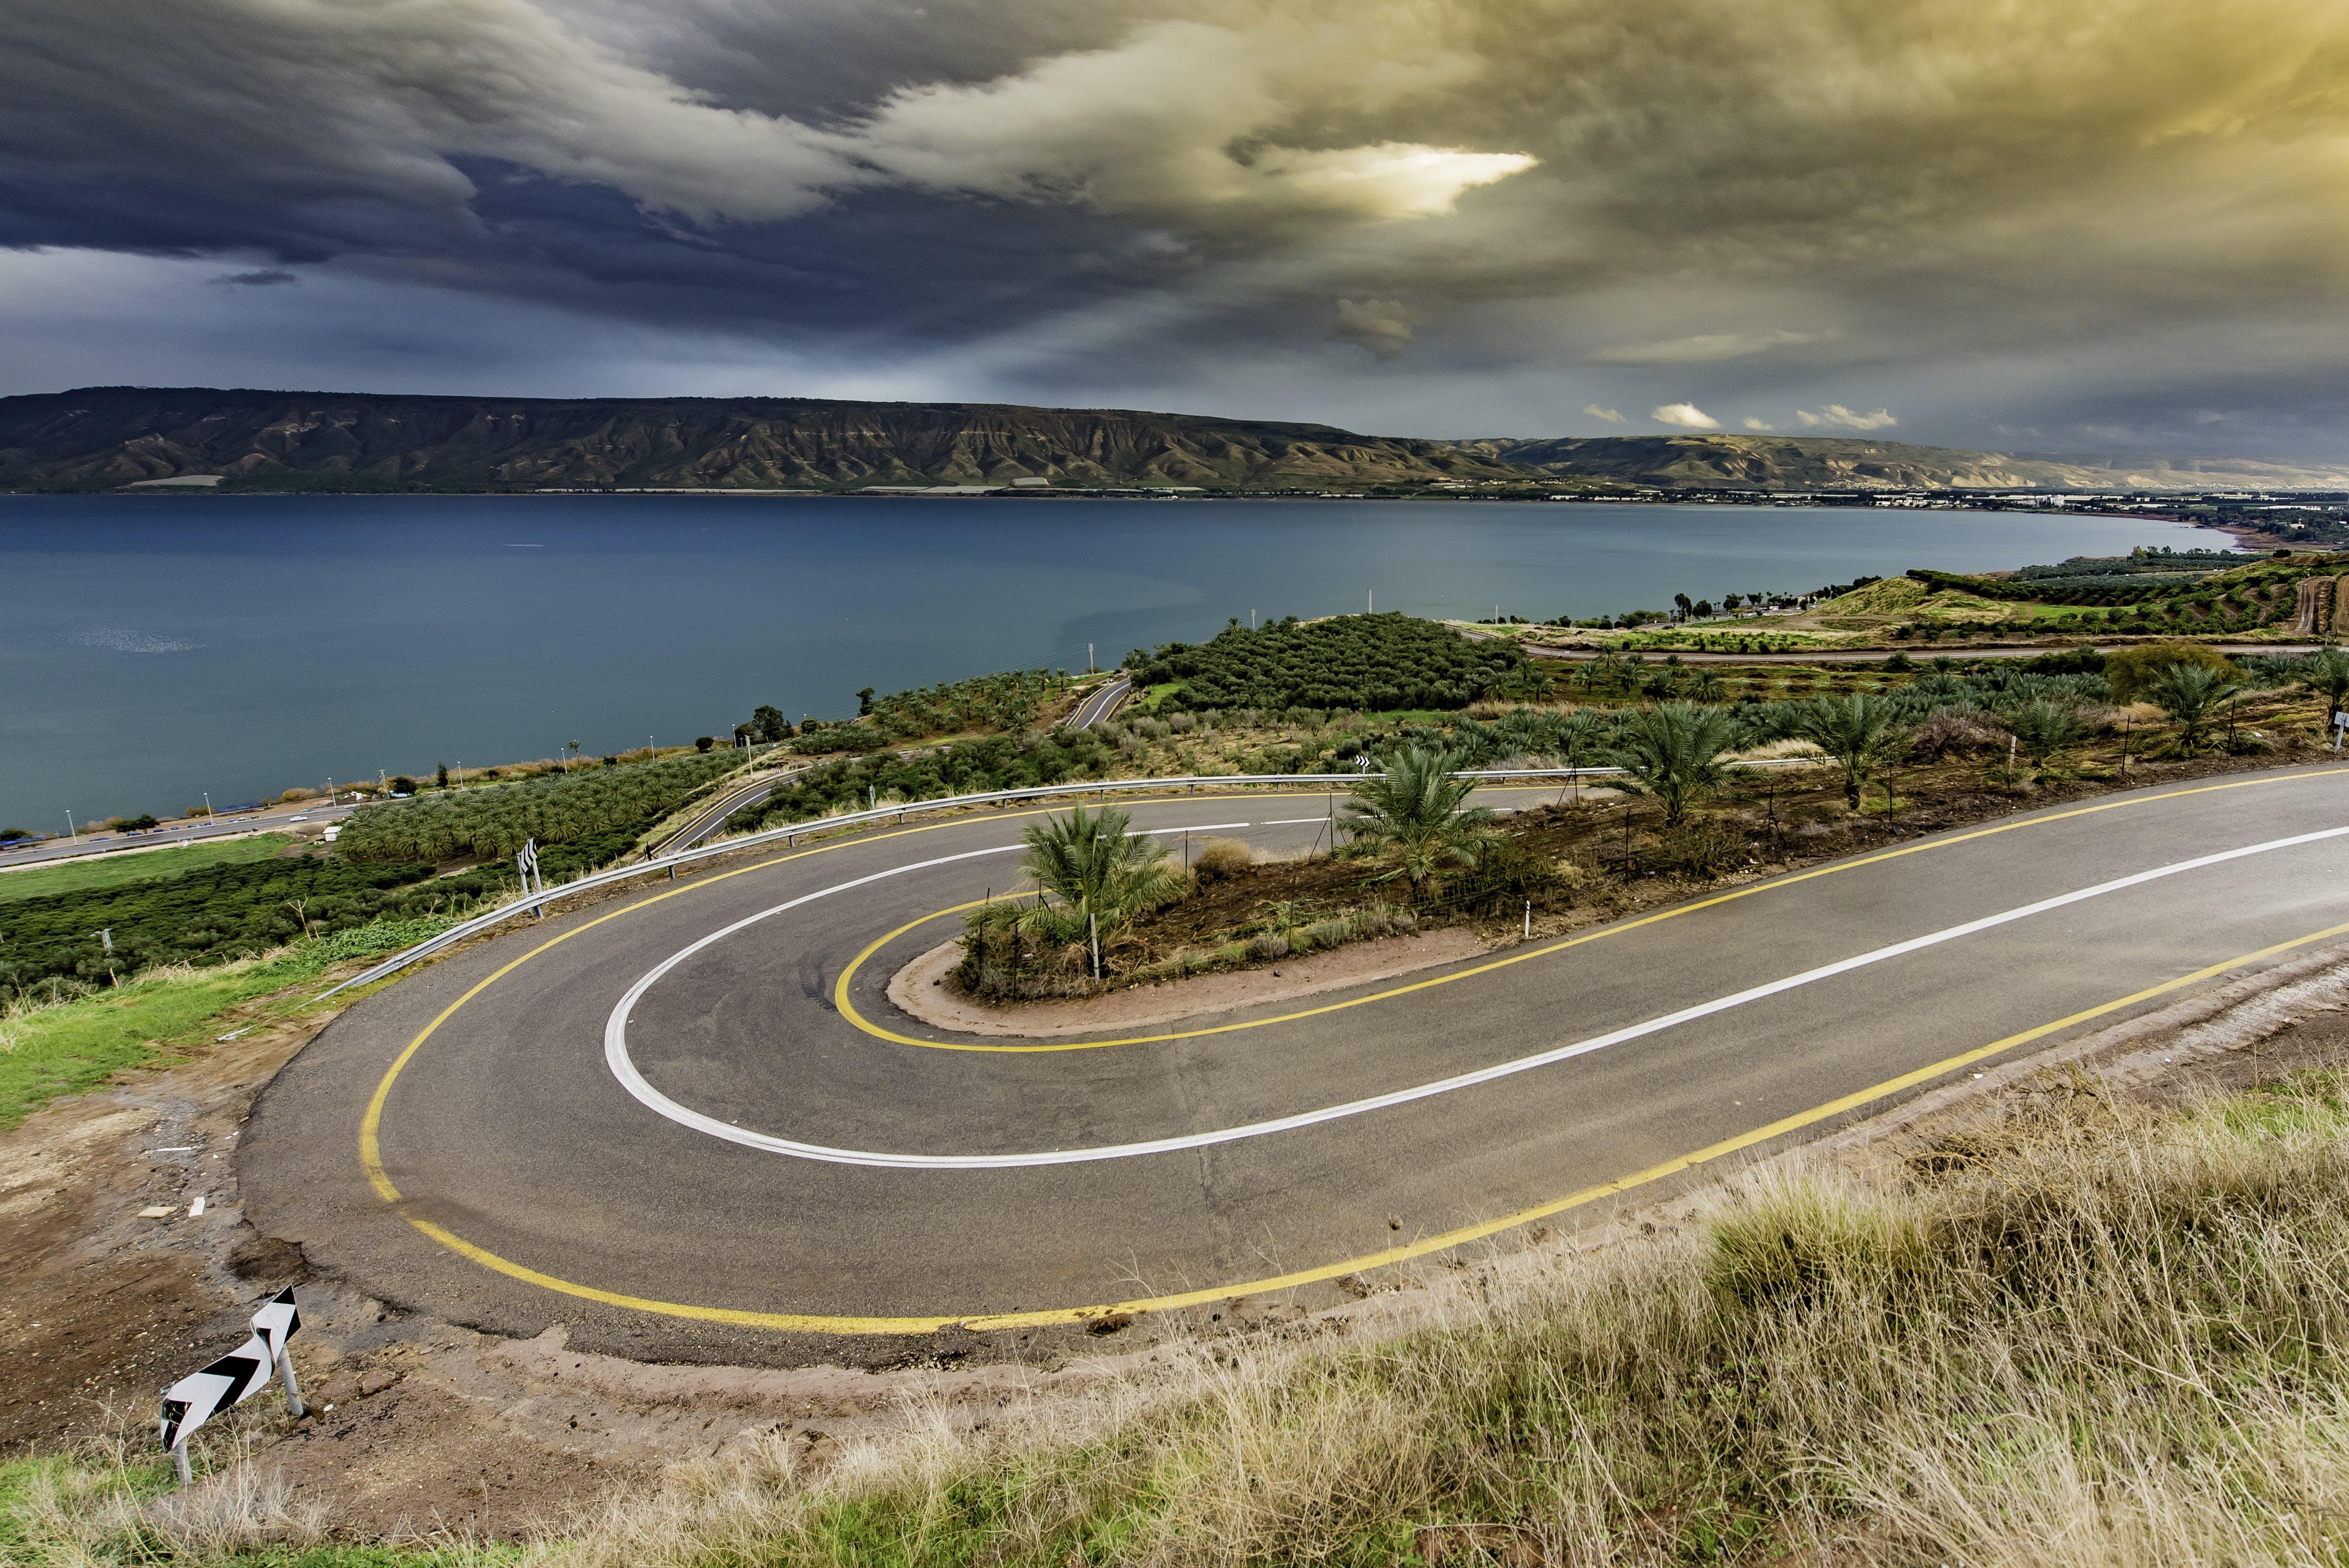 Curve Asphalt Road Near Blue Sea Under Gray Sky